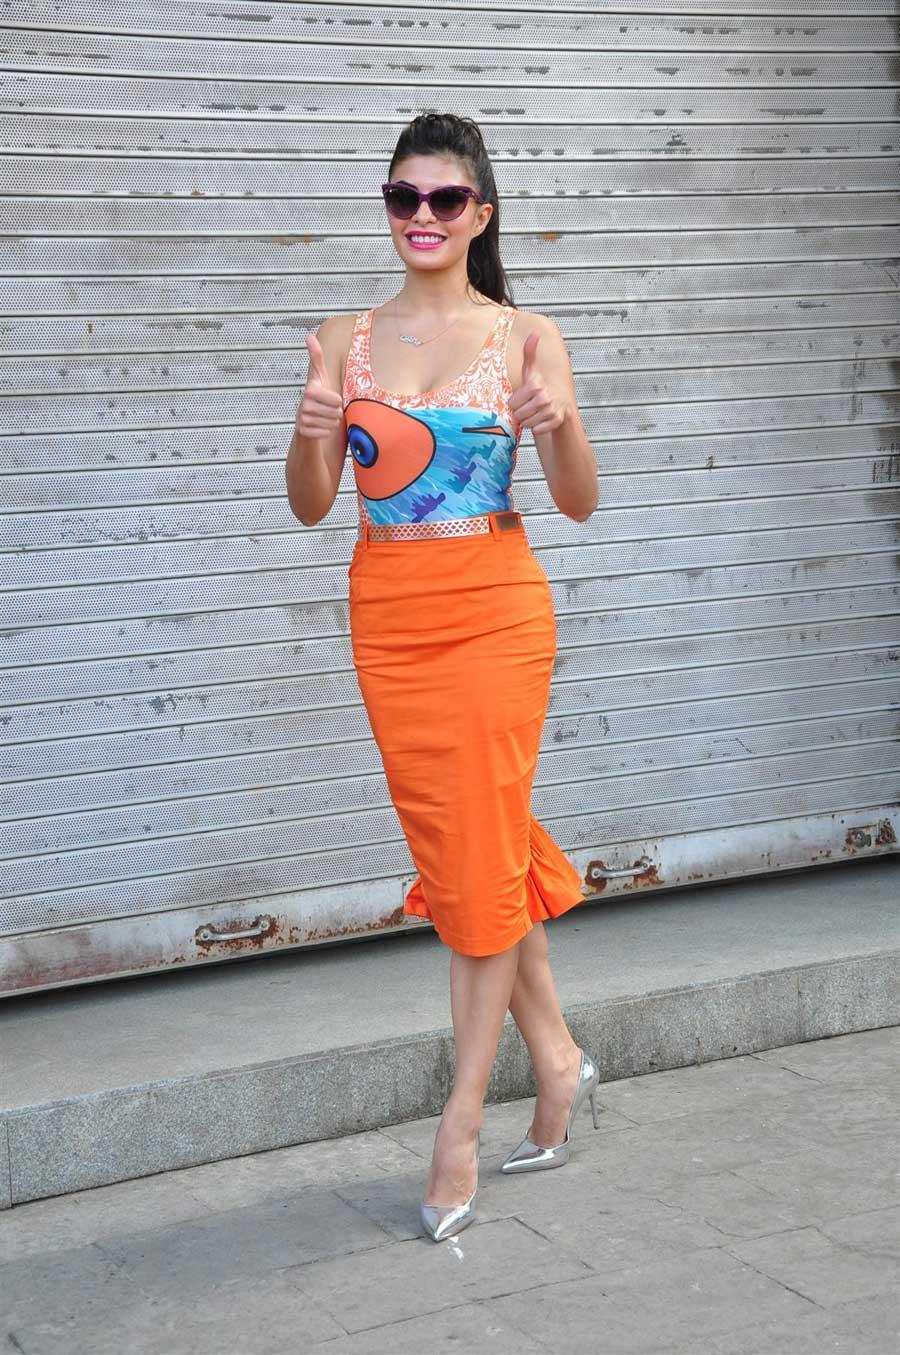 Tiger Shroff Hd Wallpaper Jacqueline Fernandez In Sexy Dress Wallpaper Facebook